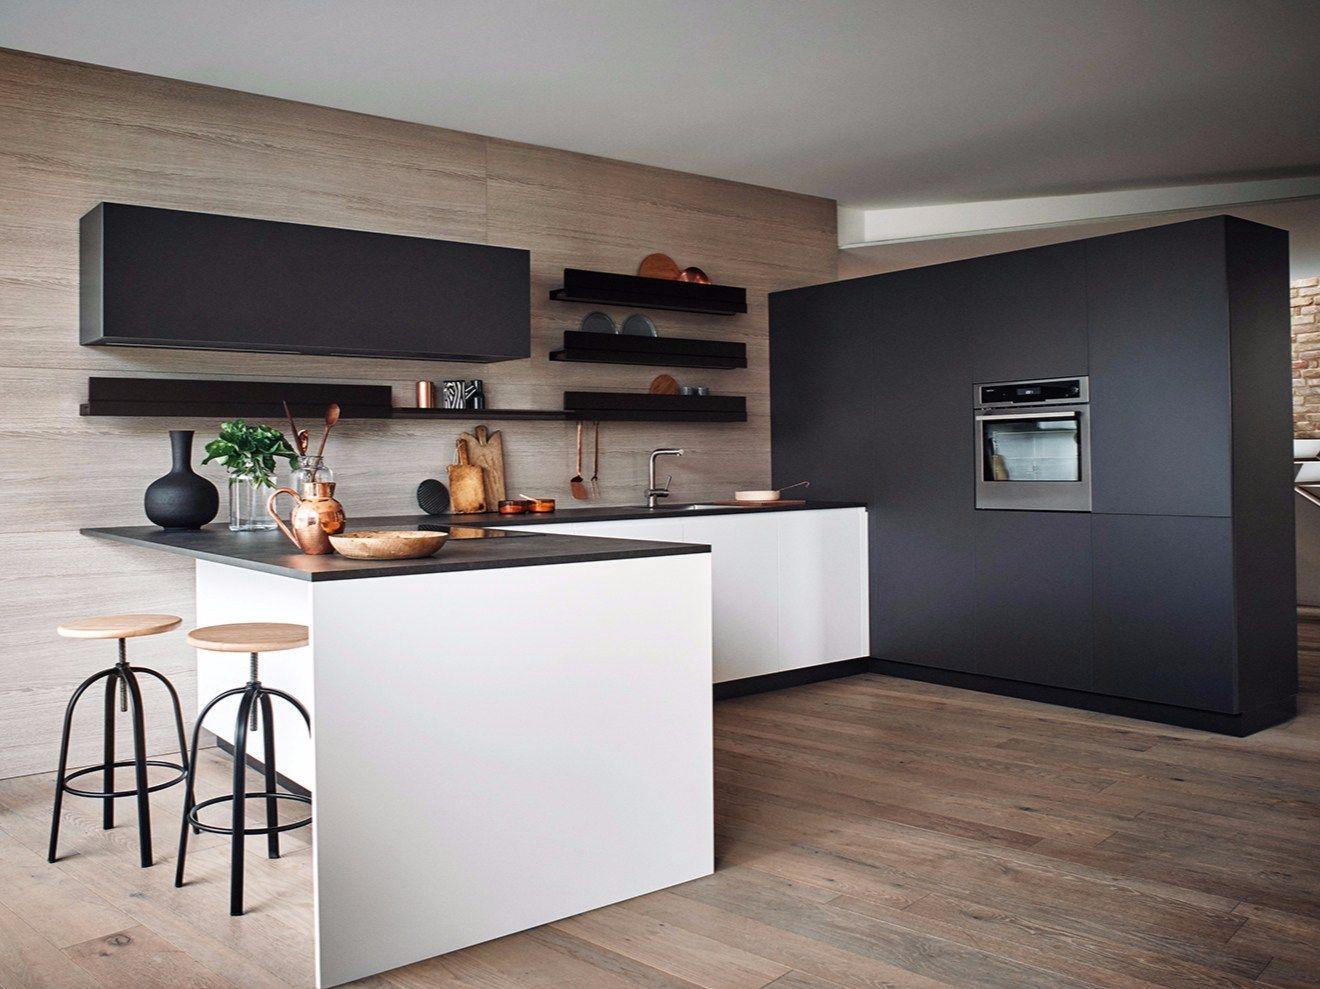 Magasin De Meuble De Cuisine Italienne cuisine intégrée laquée avec péninsule maxima 2.2